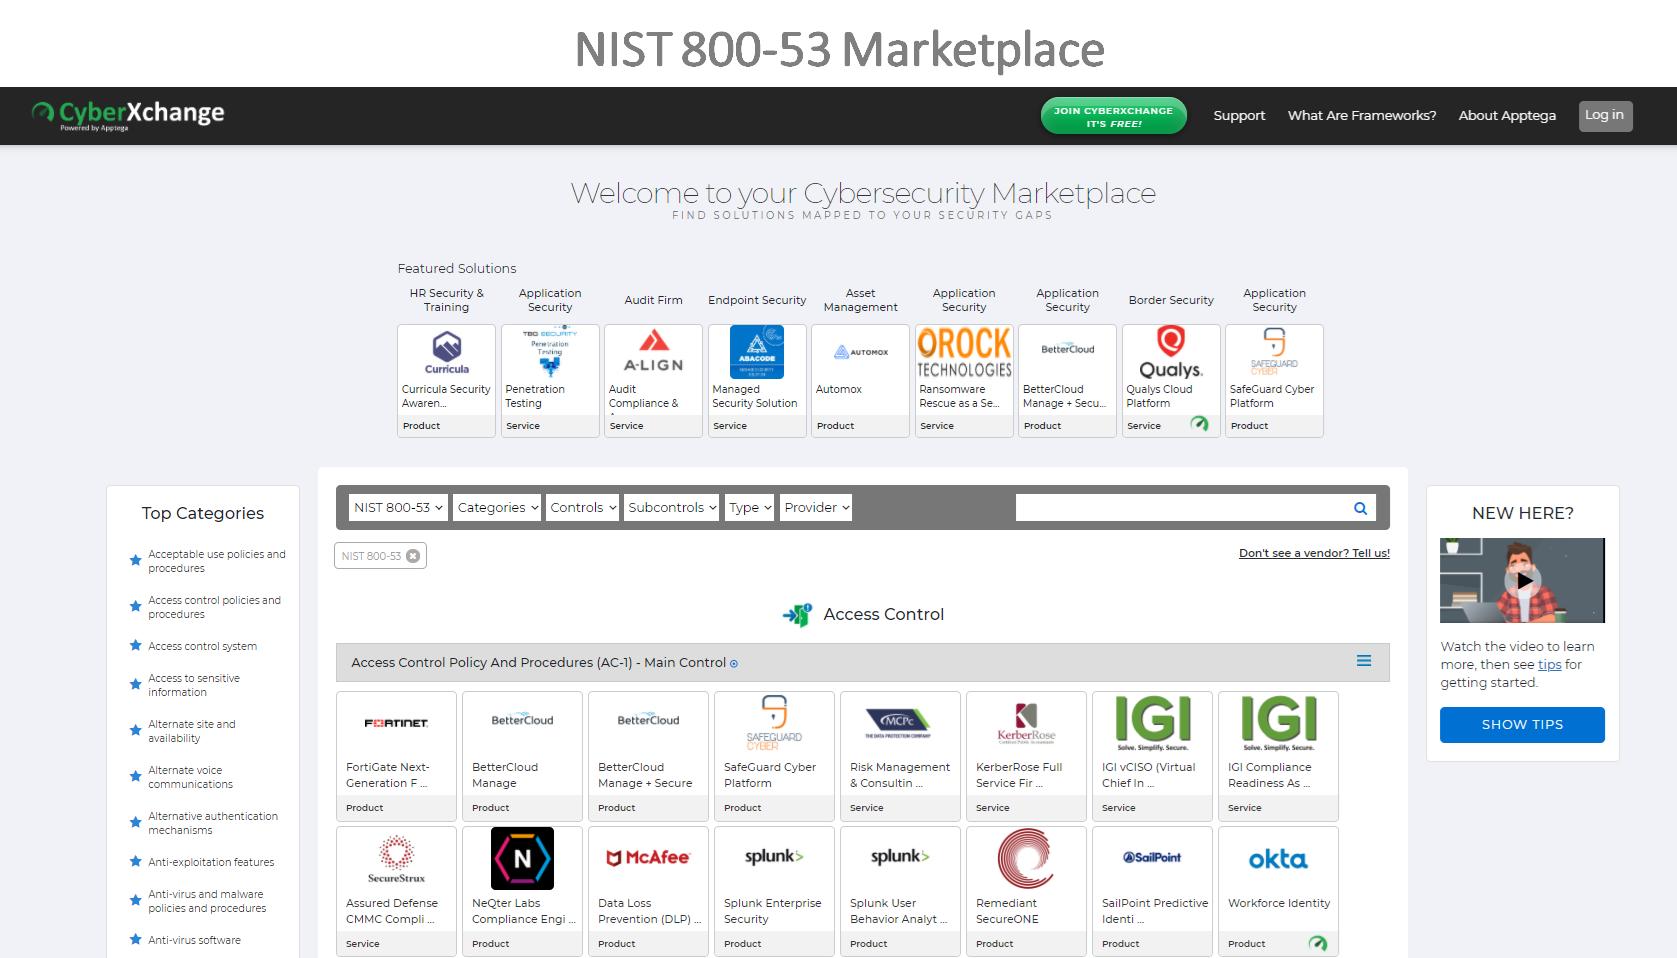 NIST 800-53 Marketplace Dashboard